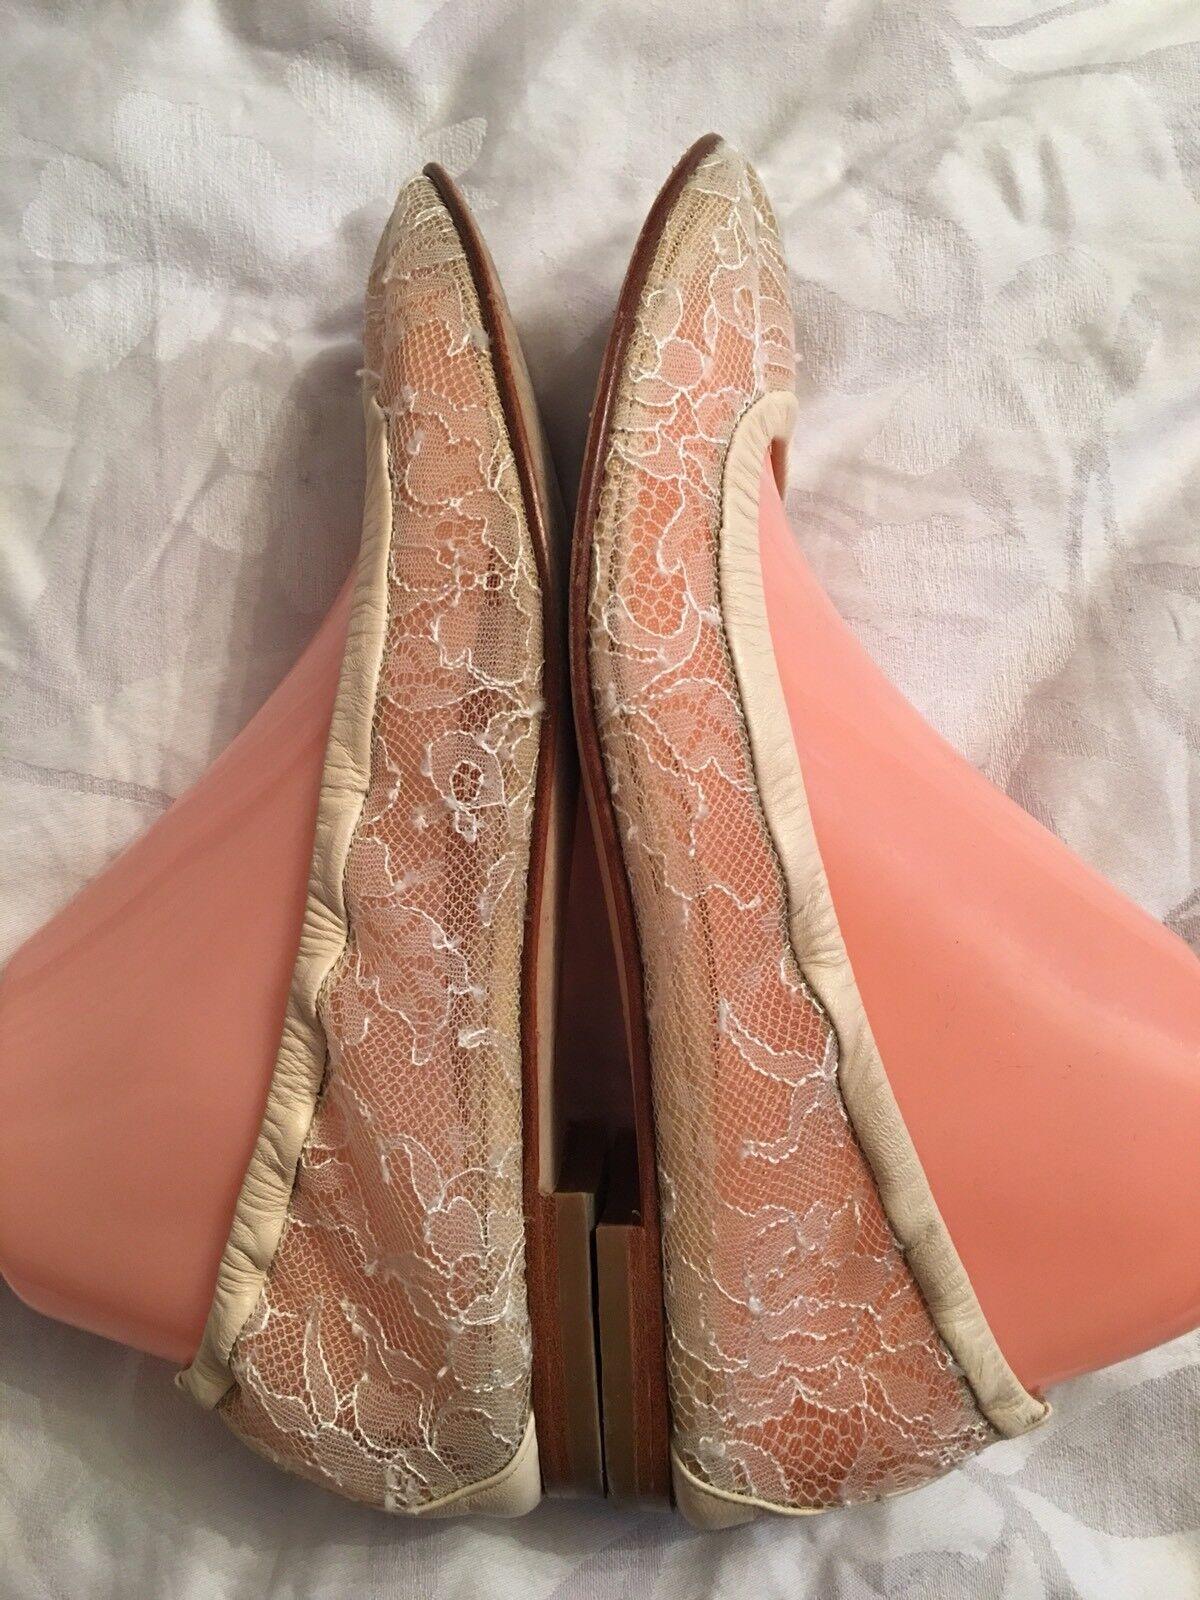 New Women's Designer Manolo Blahnik Ivory Ivory Ivory Lace Flats Size 38.5 Made In  539e7b